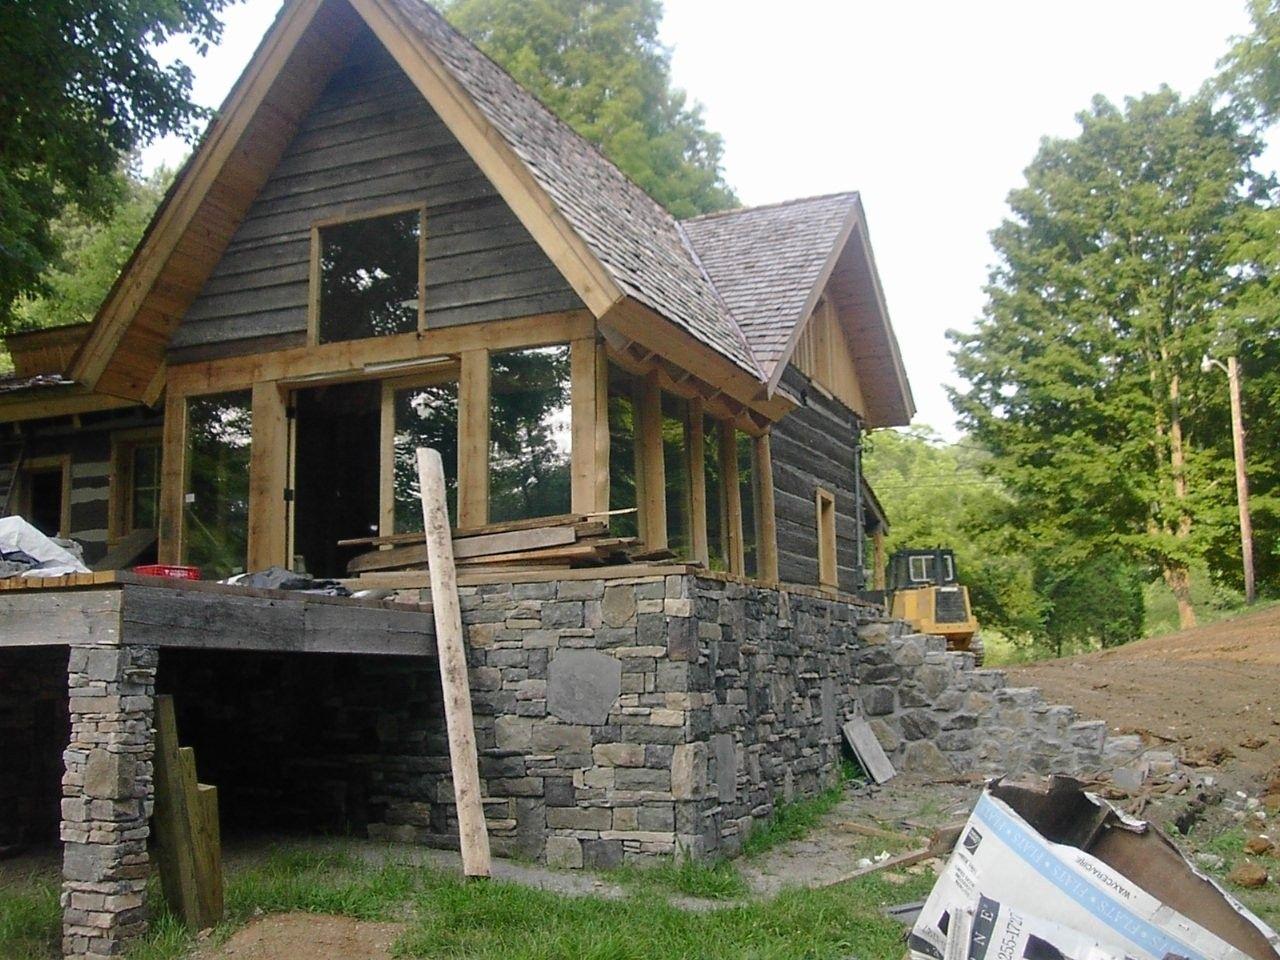 Tiny Timber Frame Cabin Plans Home Design Timber Frame Cabin Plans Timber Frame Cabin Timber House